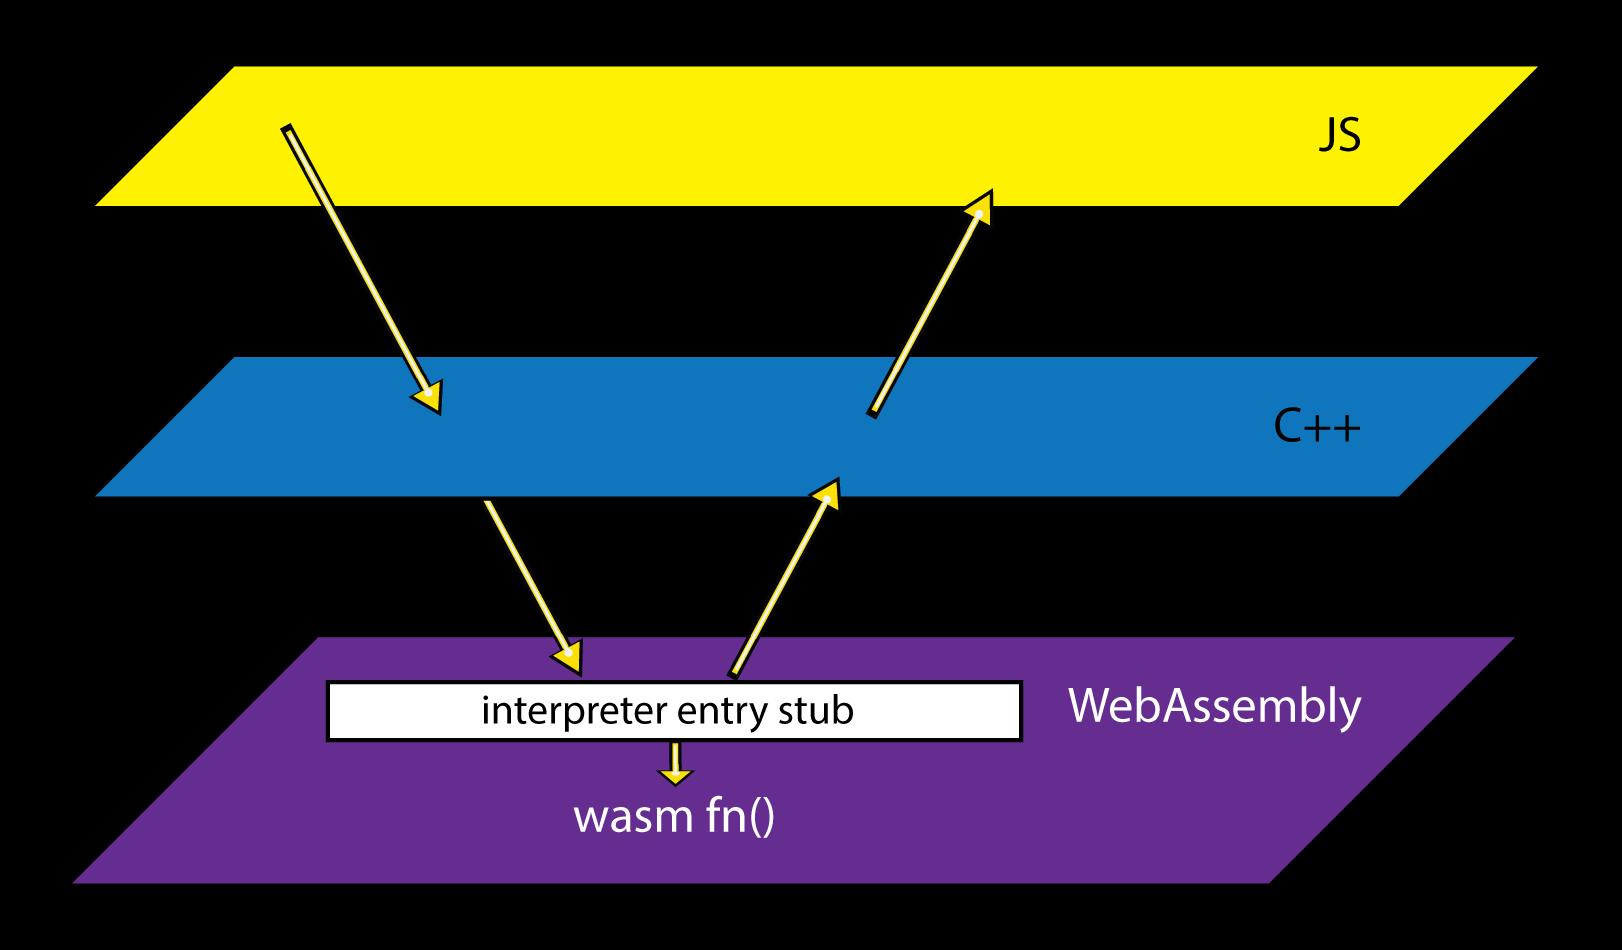 Diagram showing interpreter entry stub